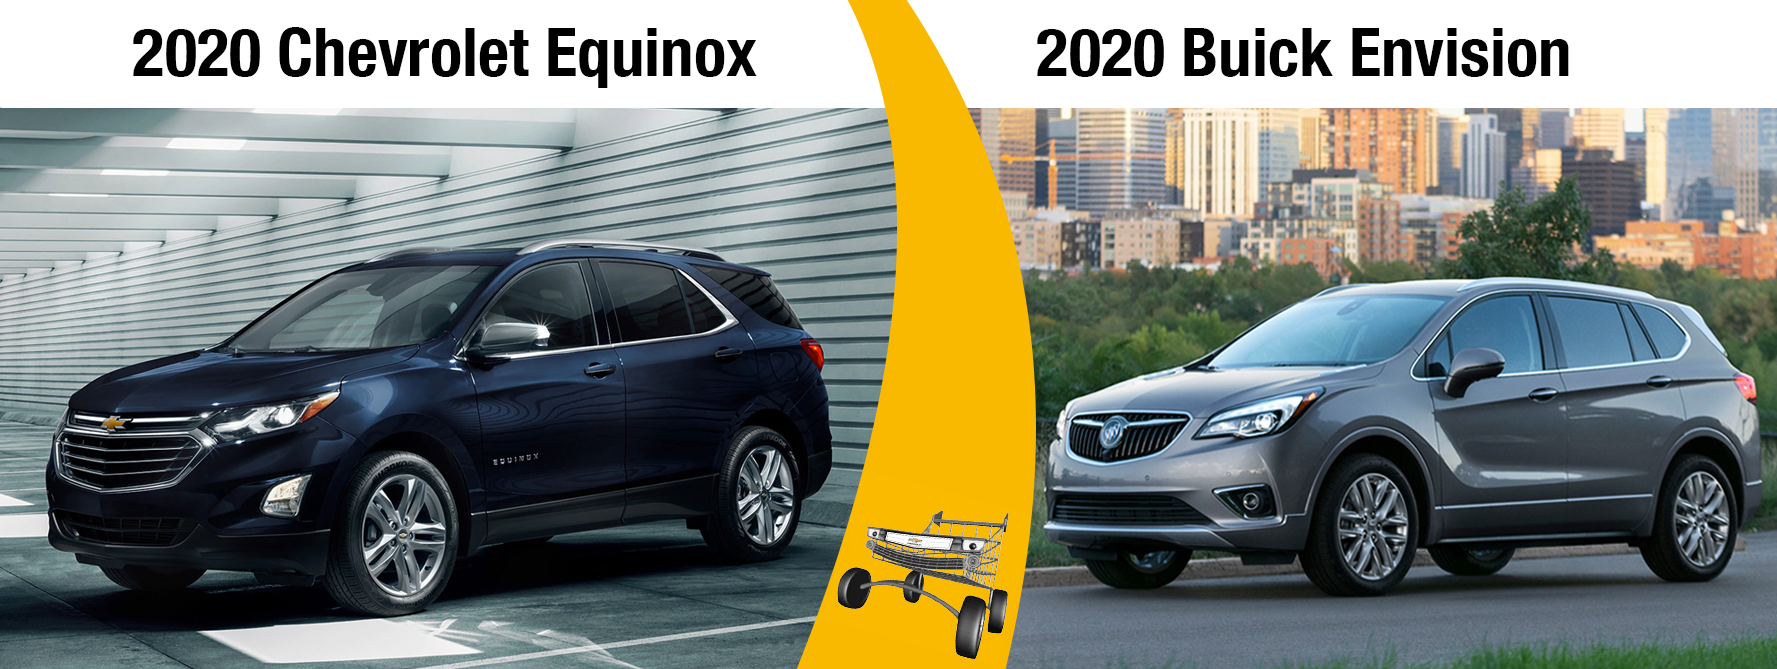 2020 Chevy Equinox vs 2020 Buick Envision